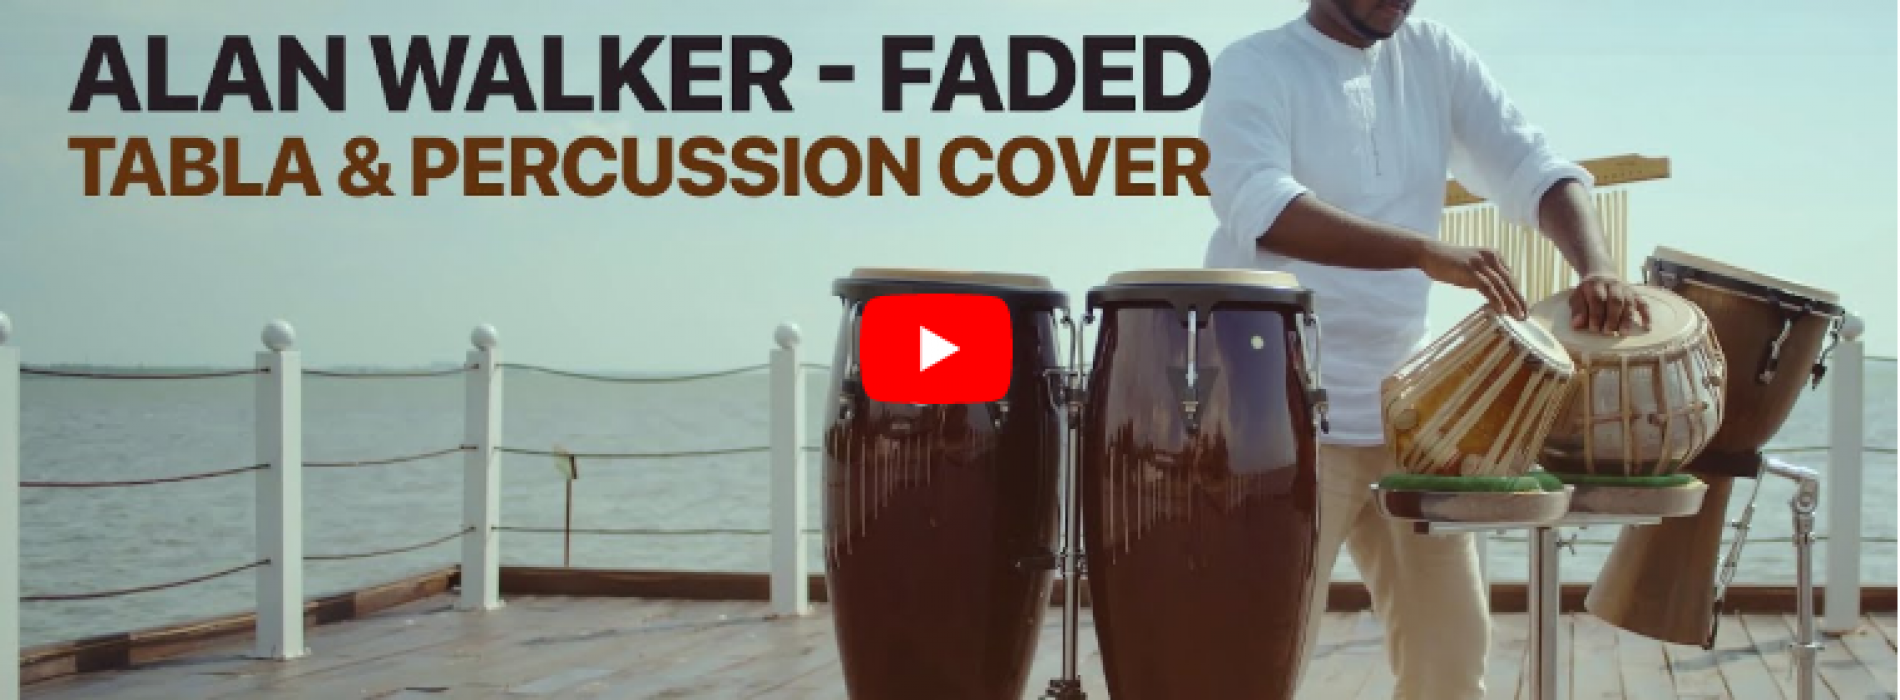 Alan Walker – Faded (Tabla & Percussion Cover) Sashika Shaliya | Pettah Effect